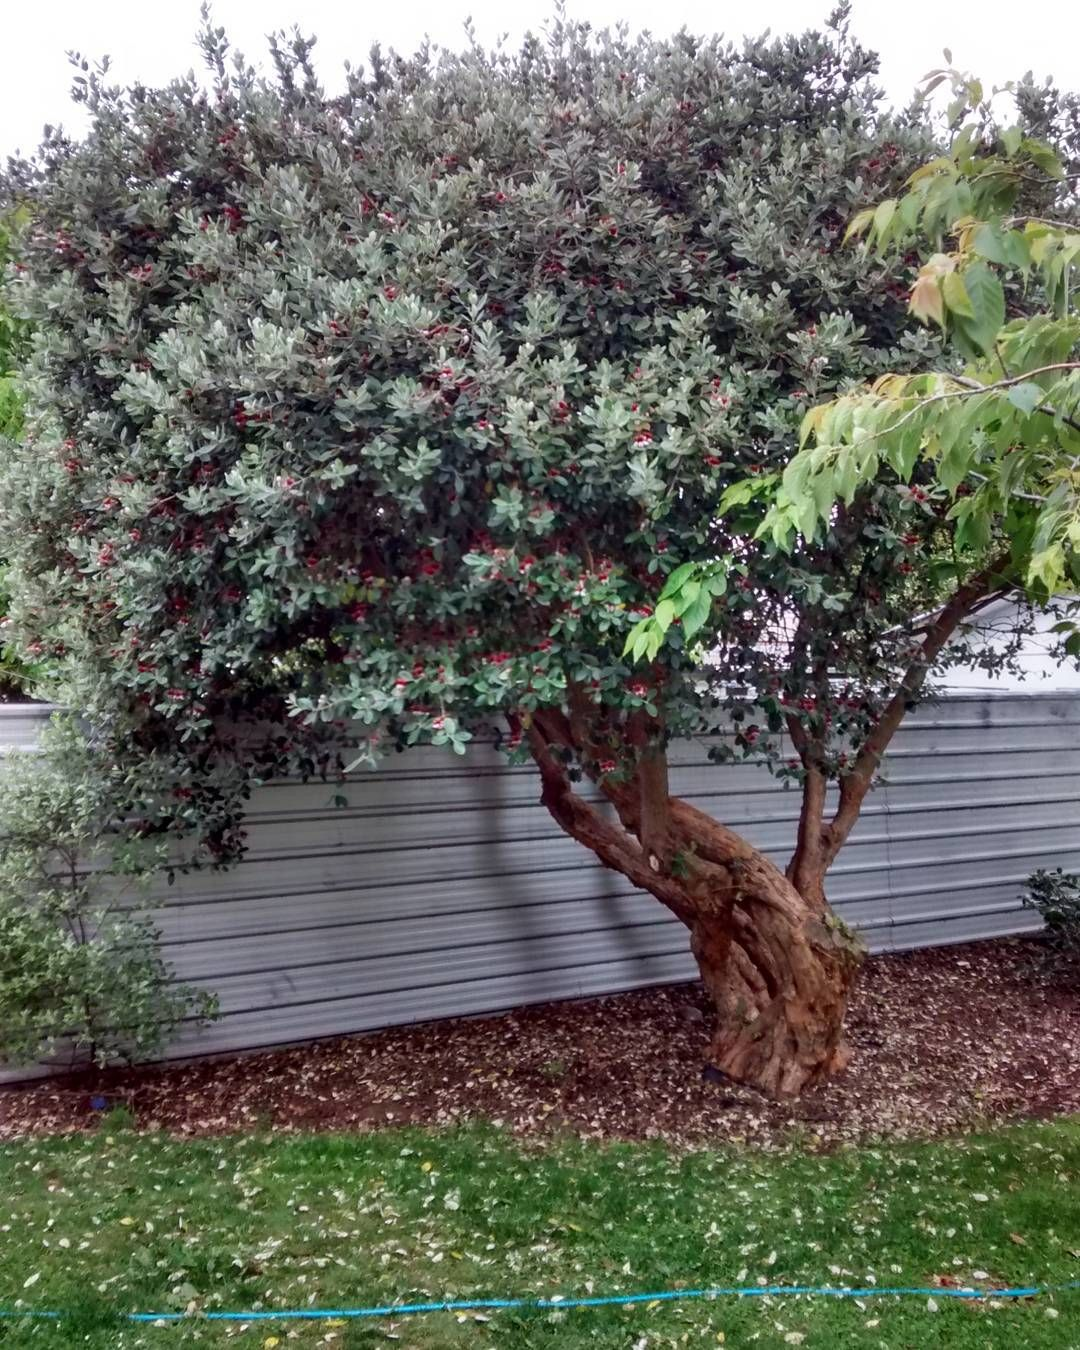 Umakant On Instagram Feijoa Tree Full Of Flowers Before Fruits Nz Christchurch Backyard Paradise Landscape Trees Garden Design